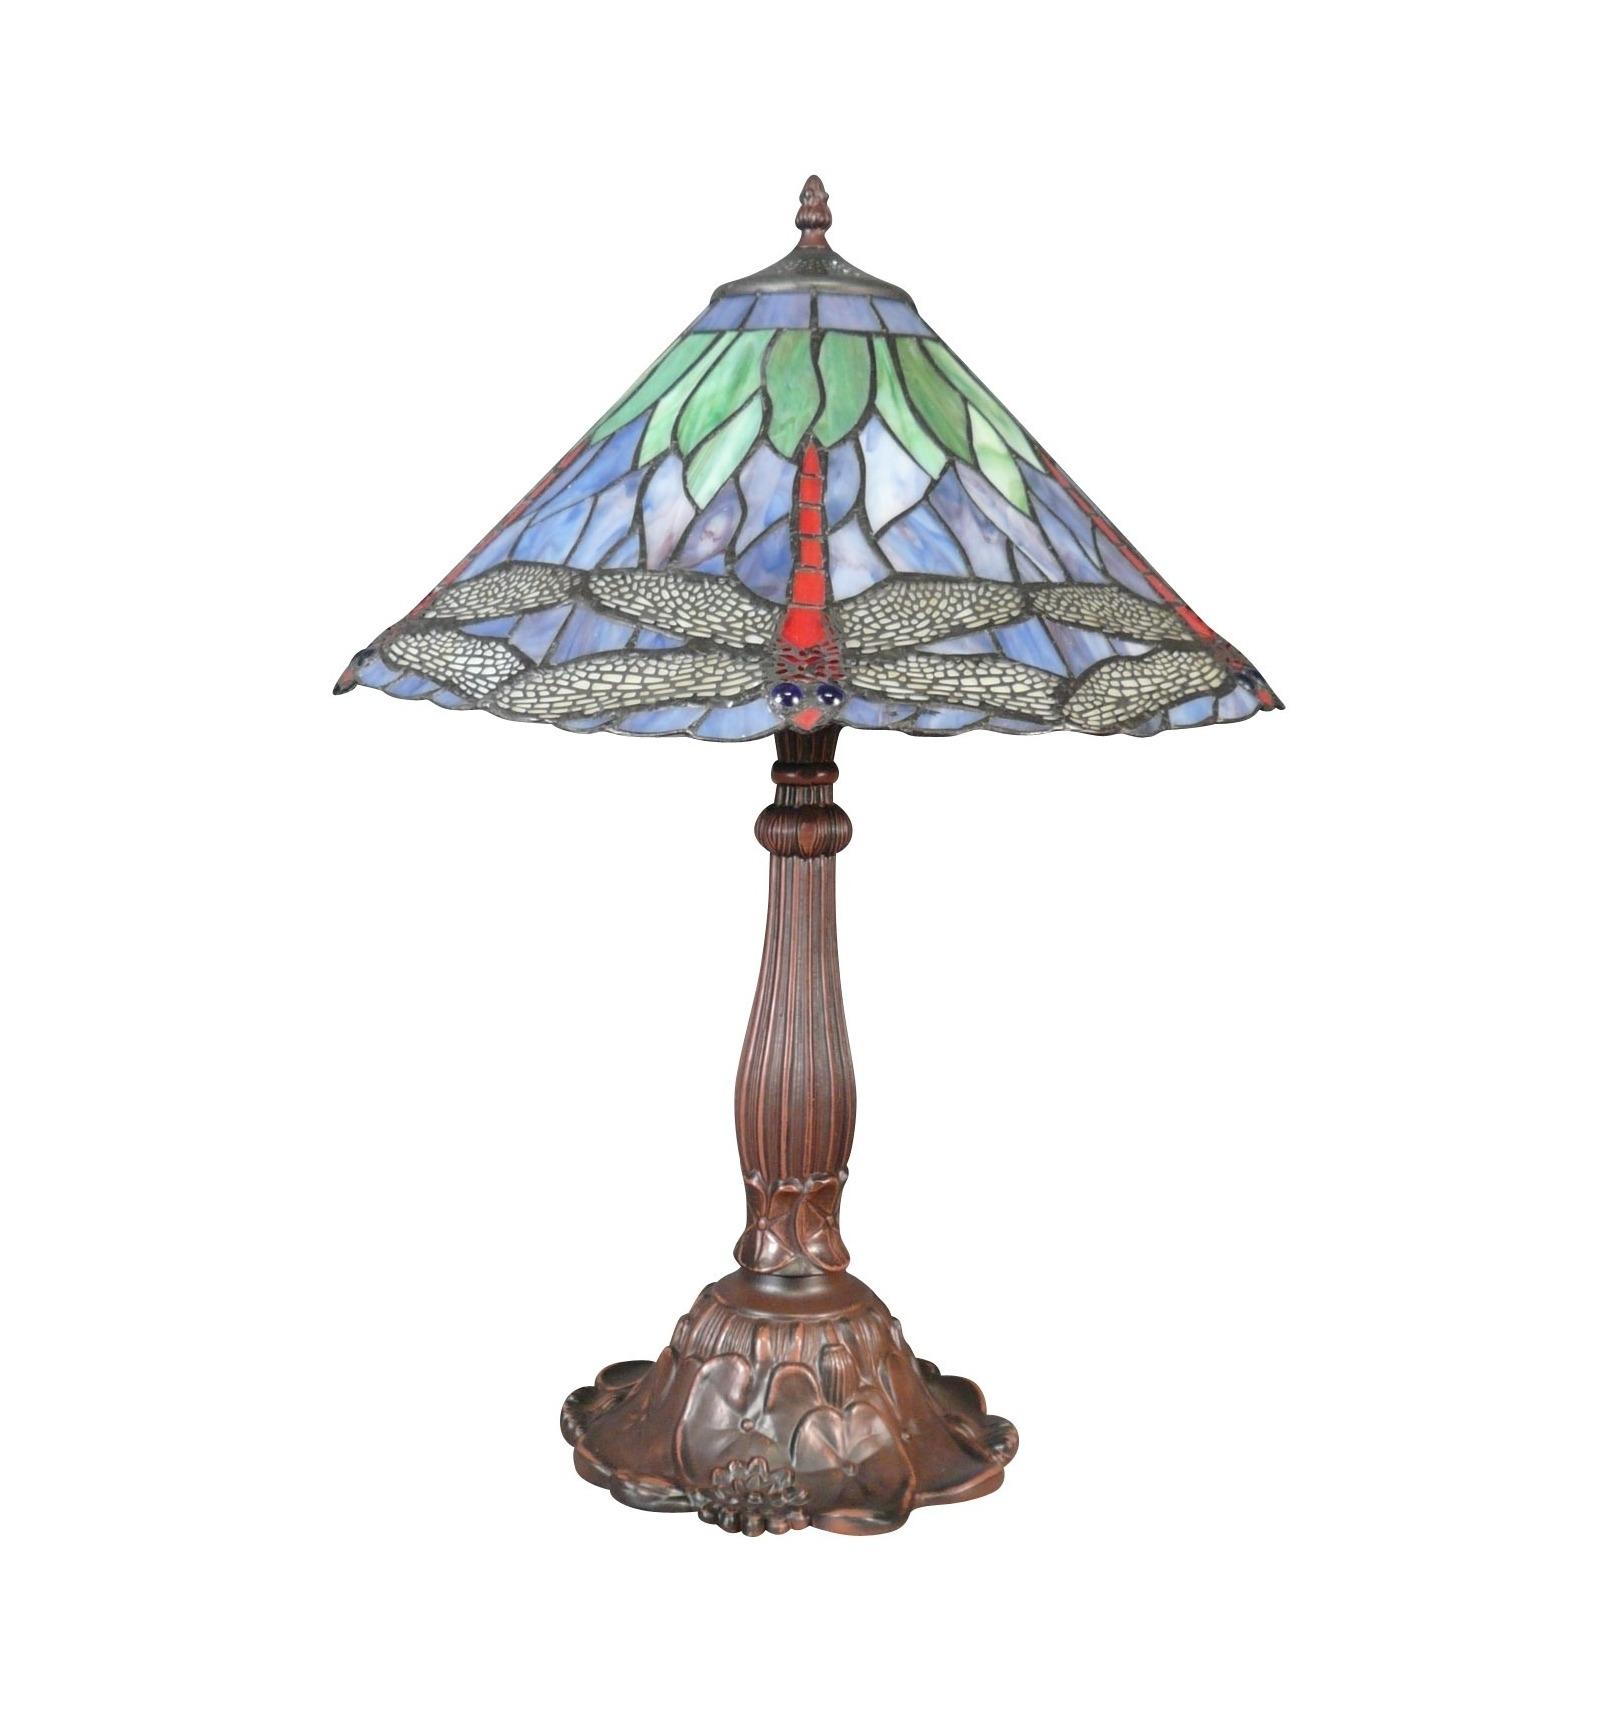 tiffany lampe libelle tischleuchte im tiffany. Black Bedroom Furniture Sets. Home Design Ideas